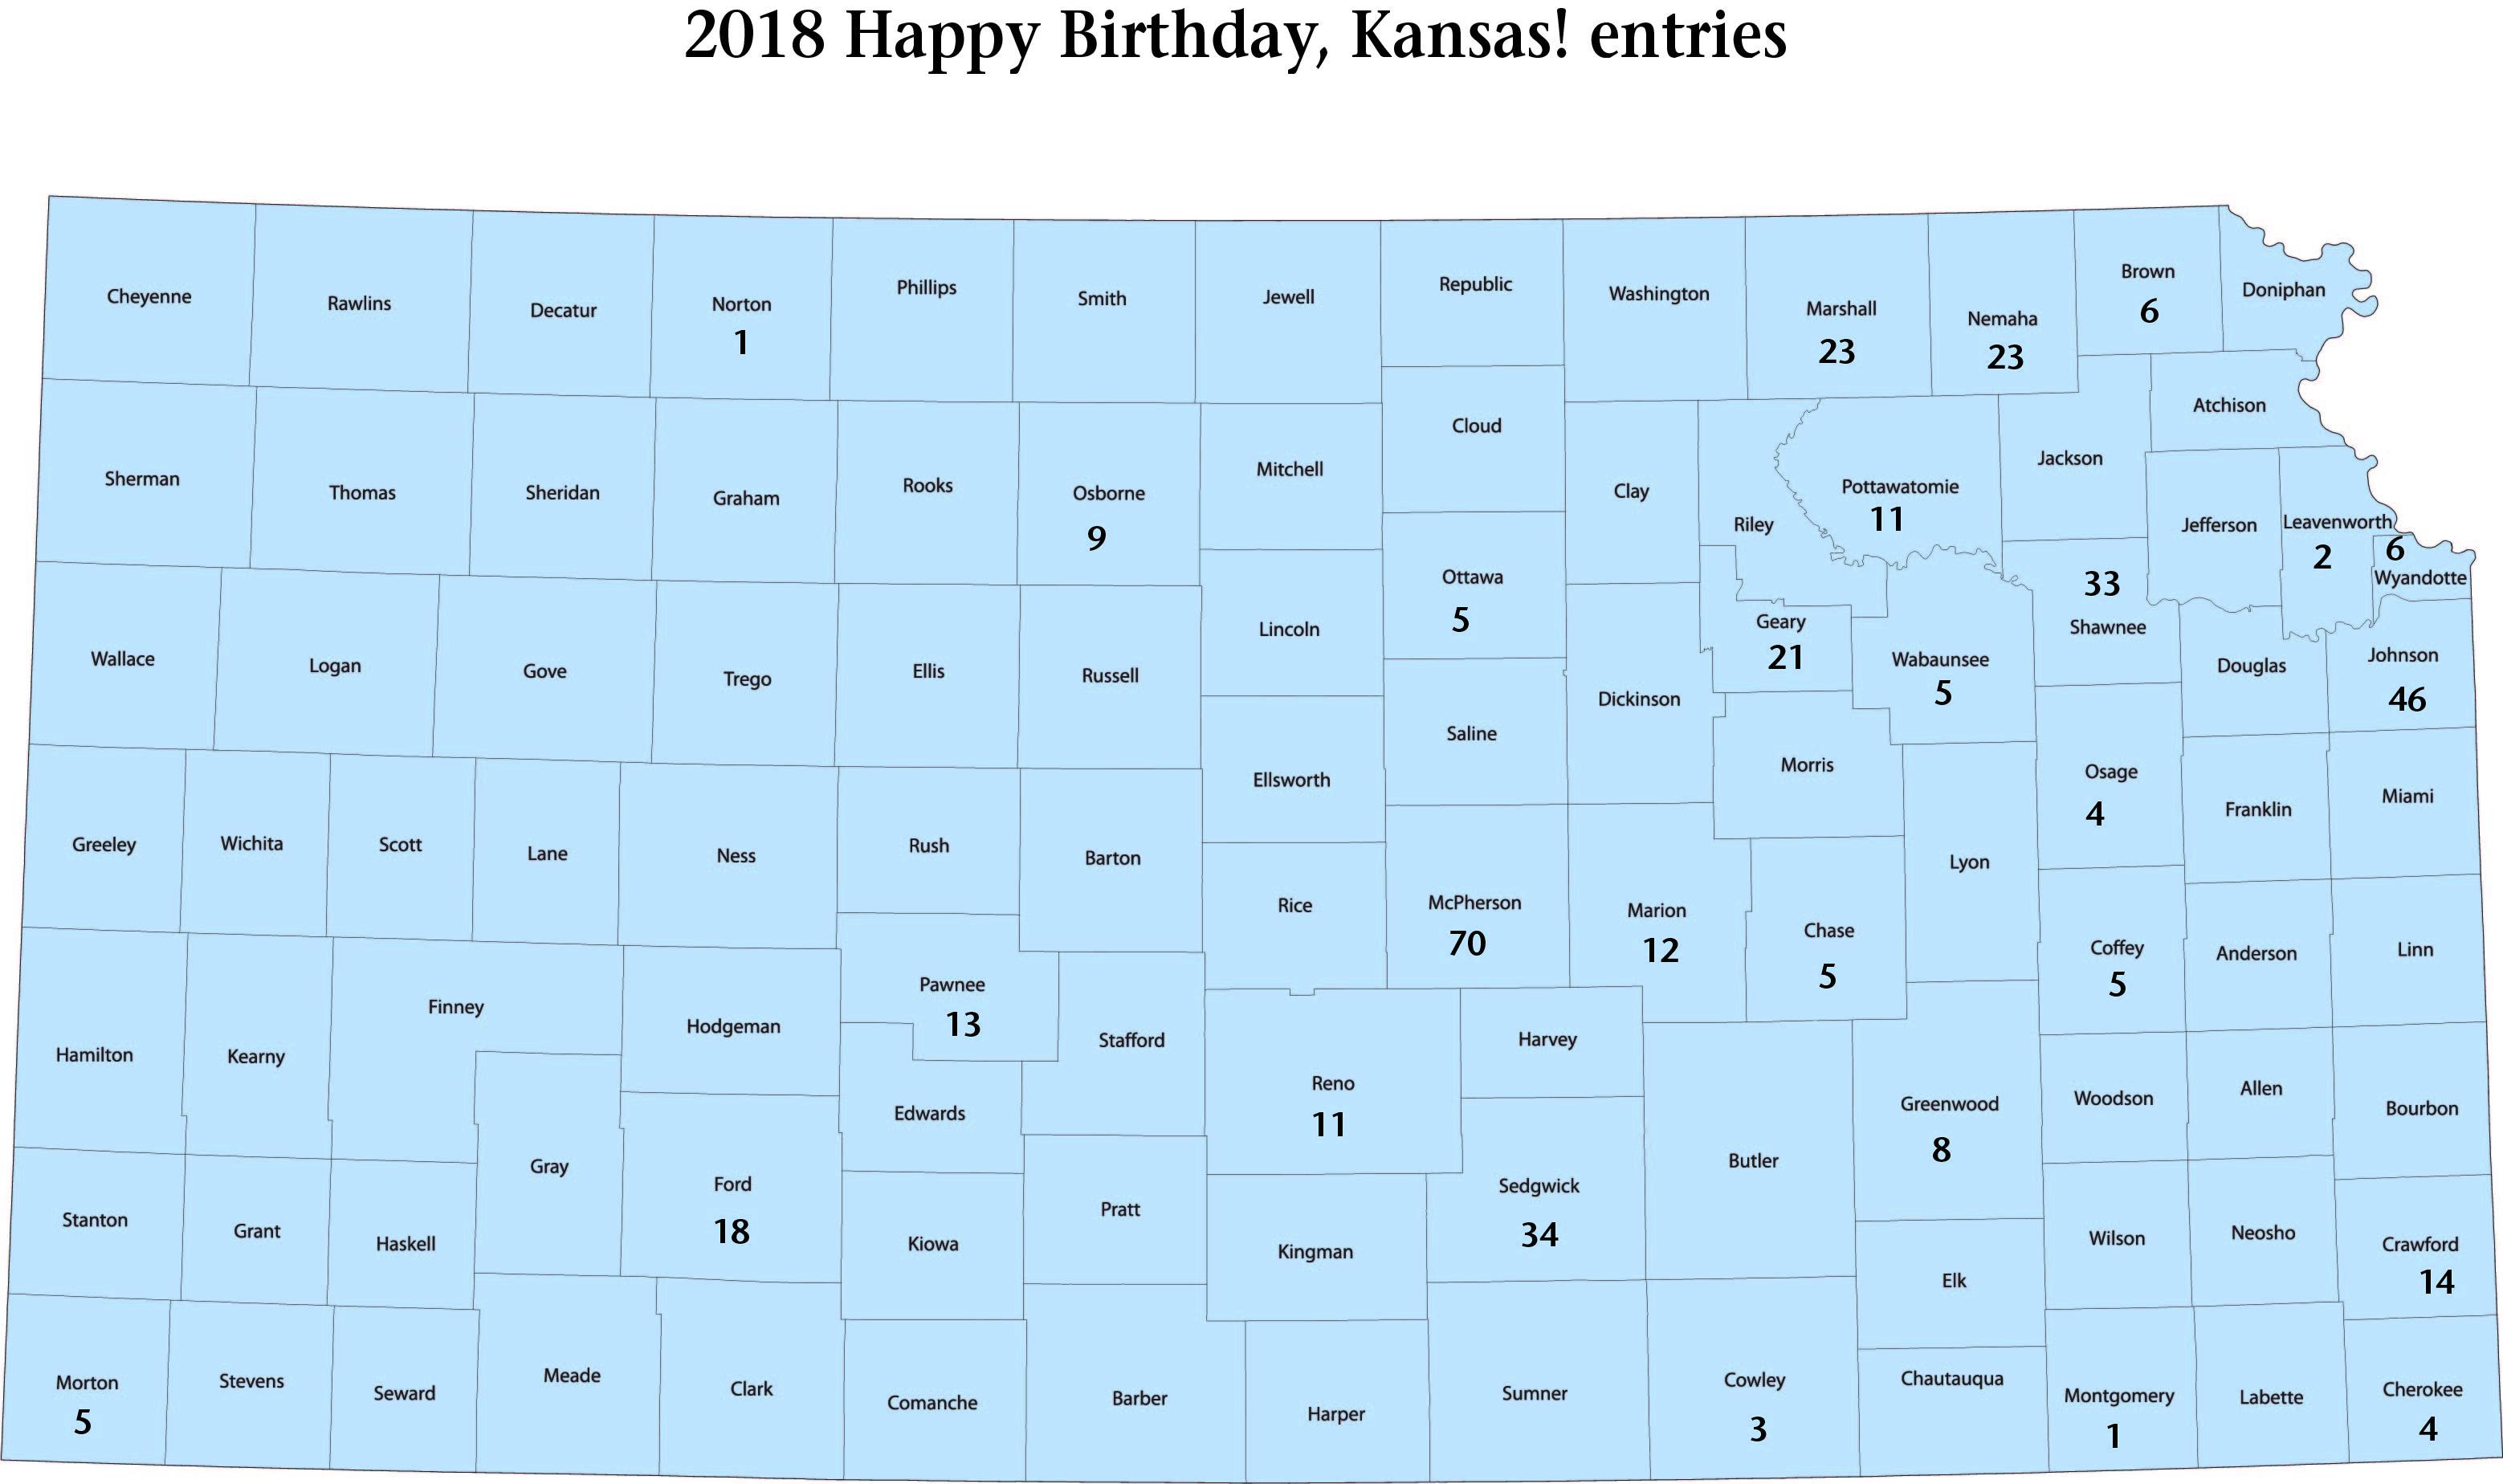 Happy Birthday, Kansas! Student Photo Contest Entries